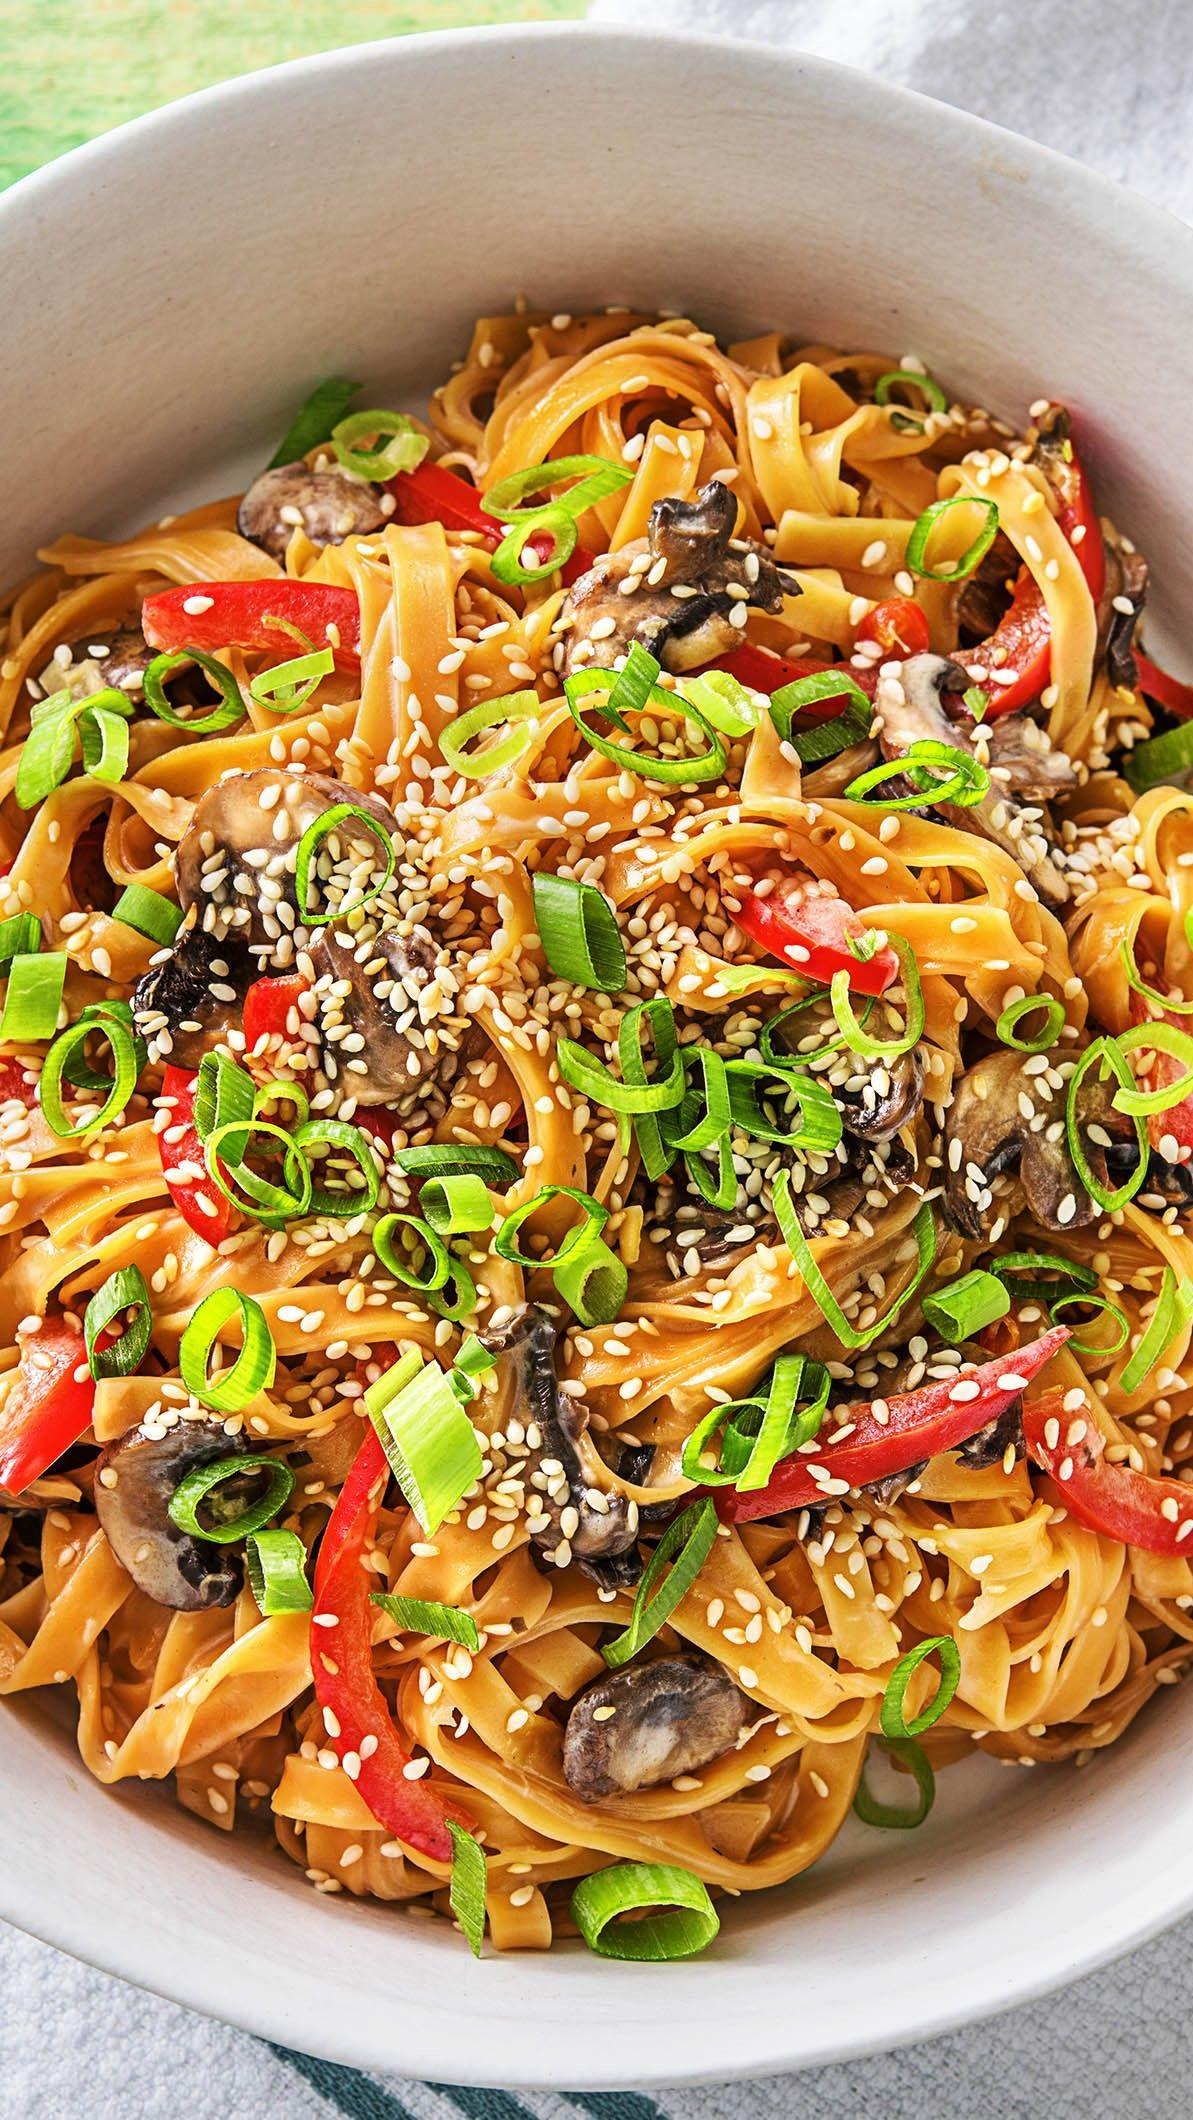 Photo of Chili noodle pan with lemongrass recipe HelloFresh